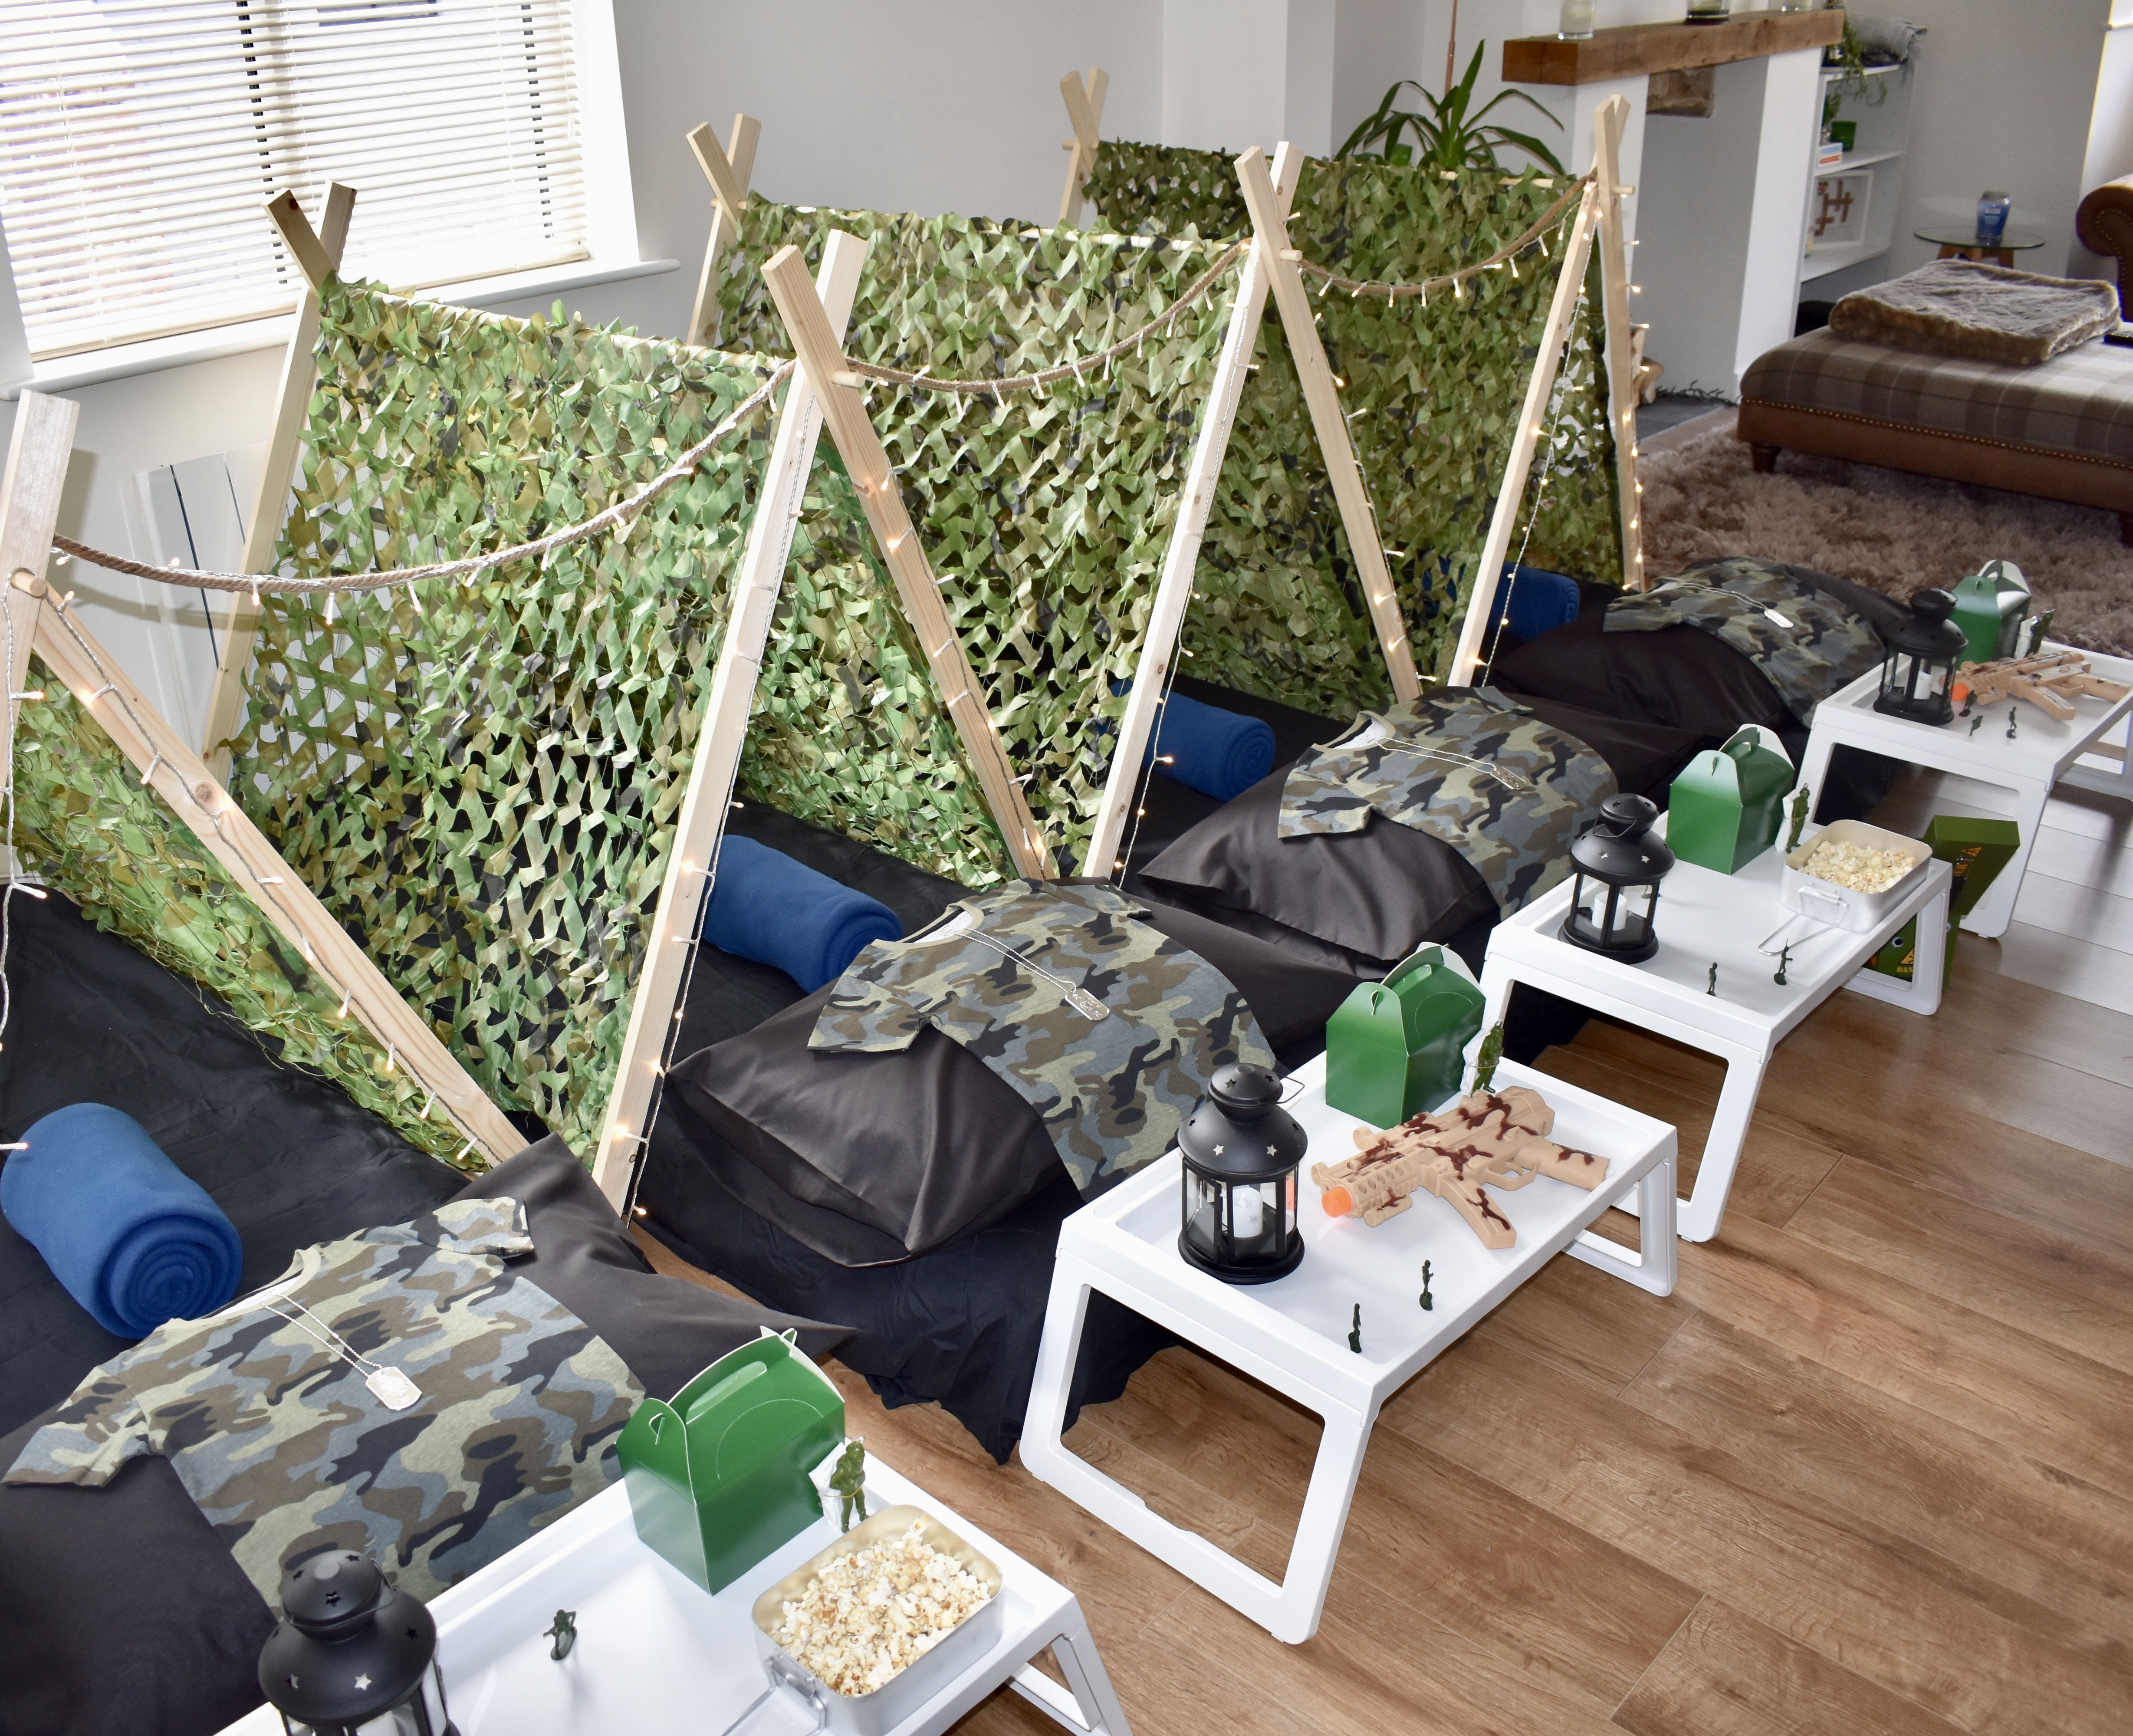 Boys Armed Themed Tent Sleepover Sleepover Birthday Parties Slumber Parties Sleepover Tents